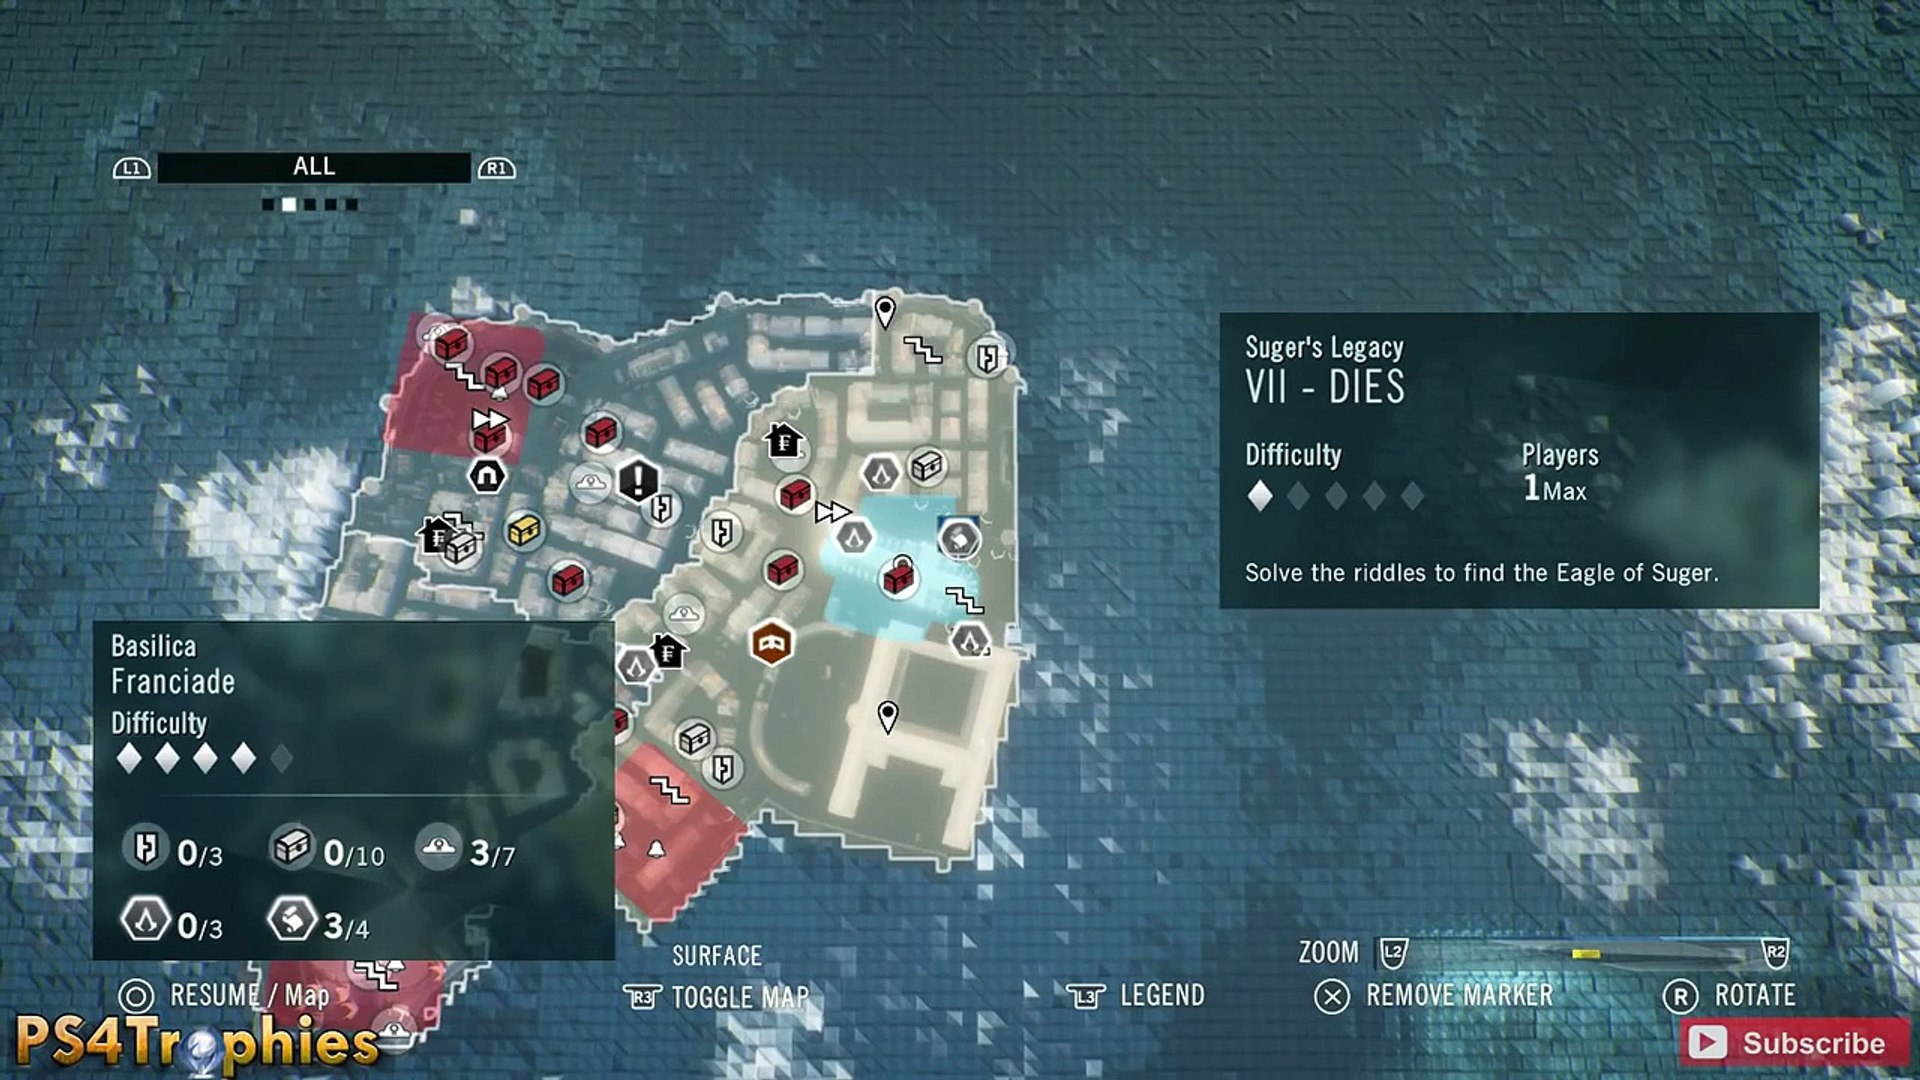 Assassins Creed Unity Dead Kings Dlc Sugers Legacy Walkthrough Vii Dies Dailymotion Video